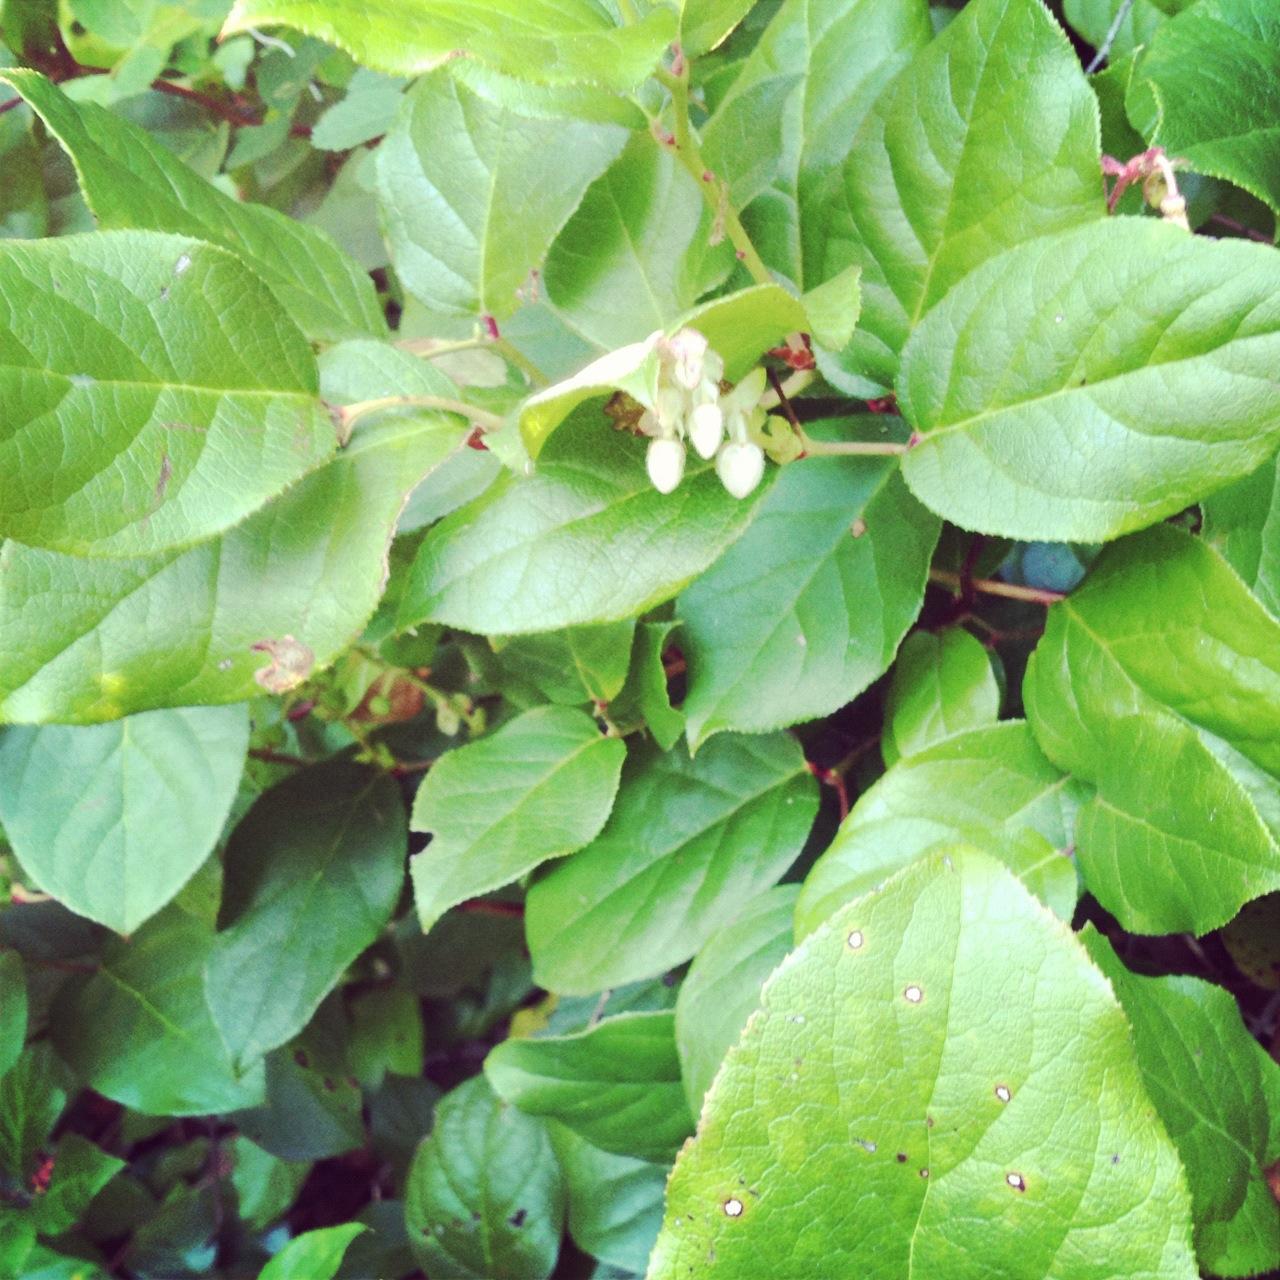 edible leaves and berries